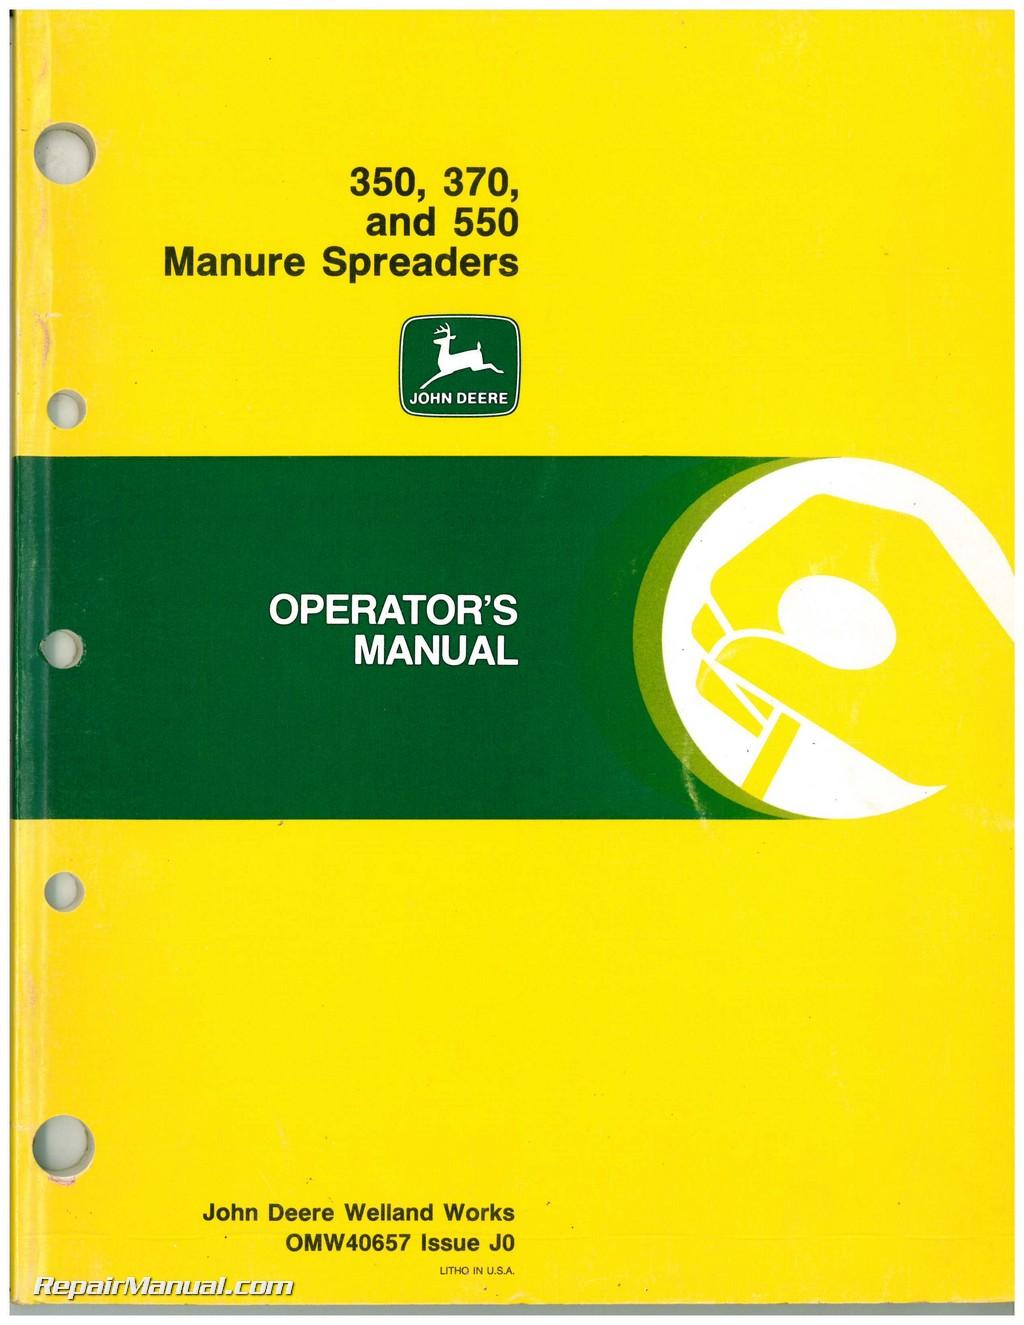 Used John Deere 350, 370, and 550 Manure Spreaders Operators Manual